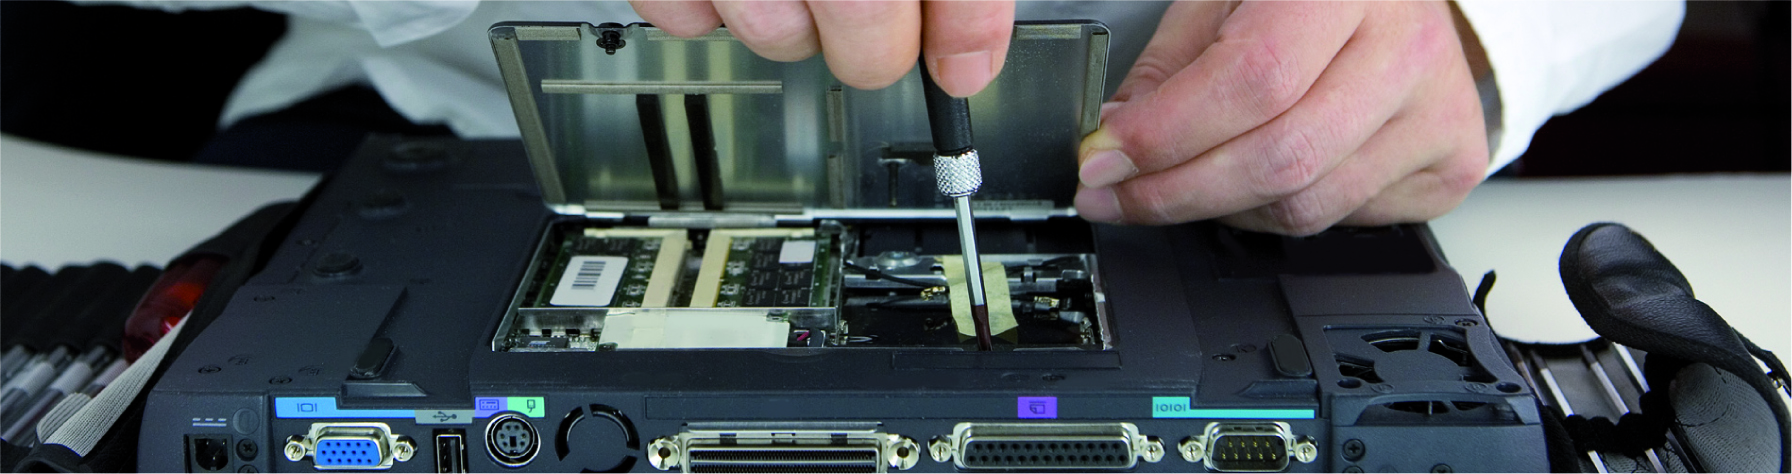 Notebook Reparatur Himmelsbach